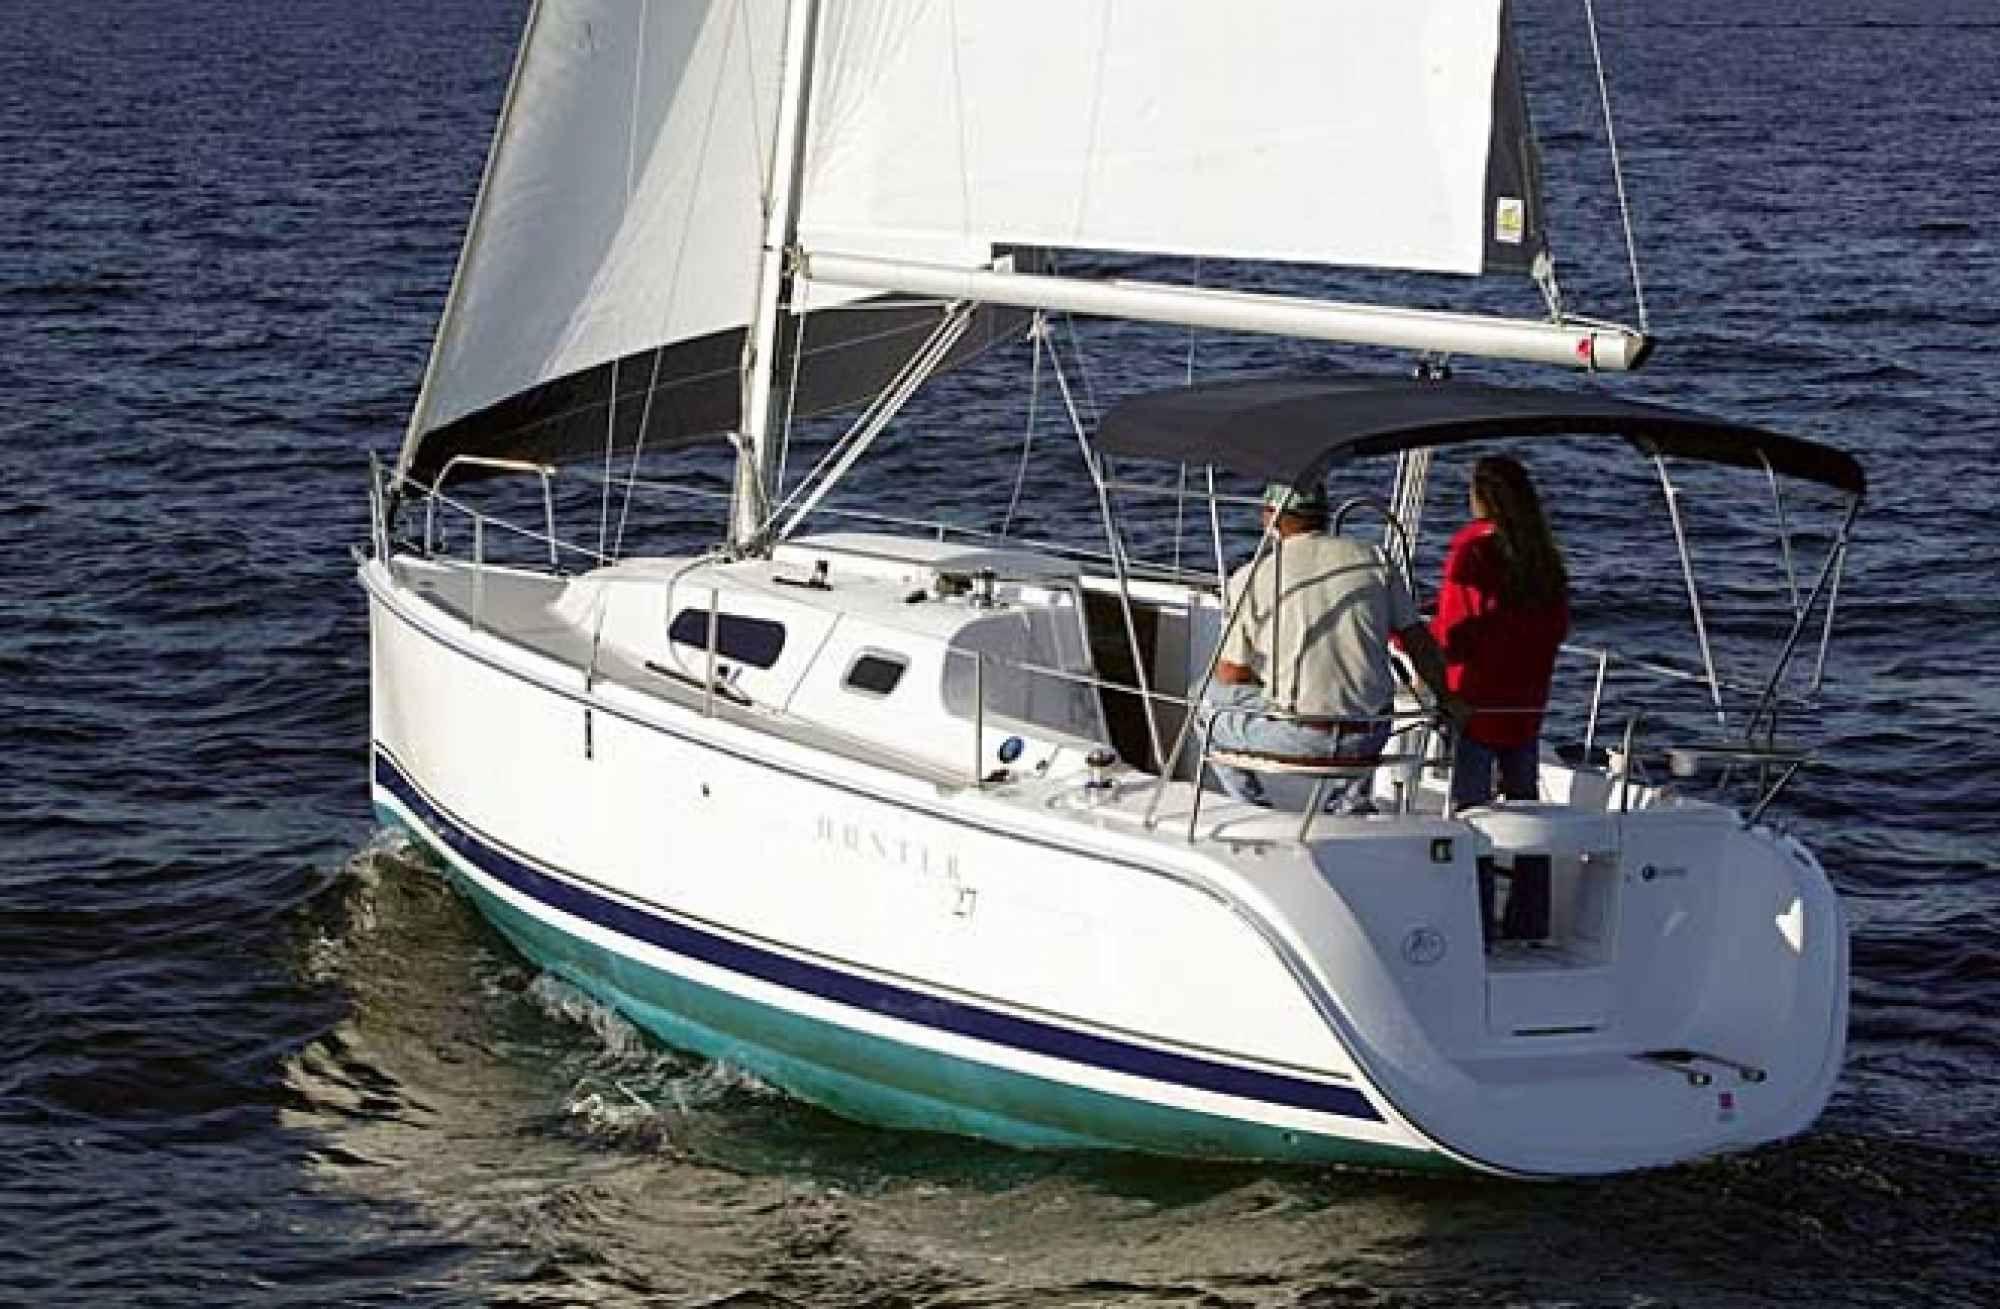 Best Pocket Cruiser Sailboats, Small Cruising Boats | Cruising World